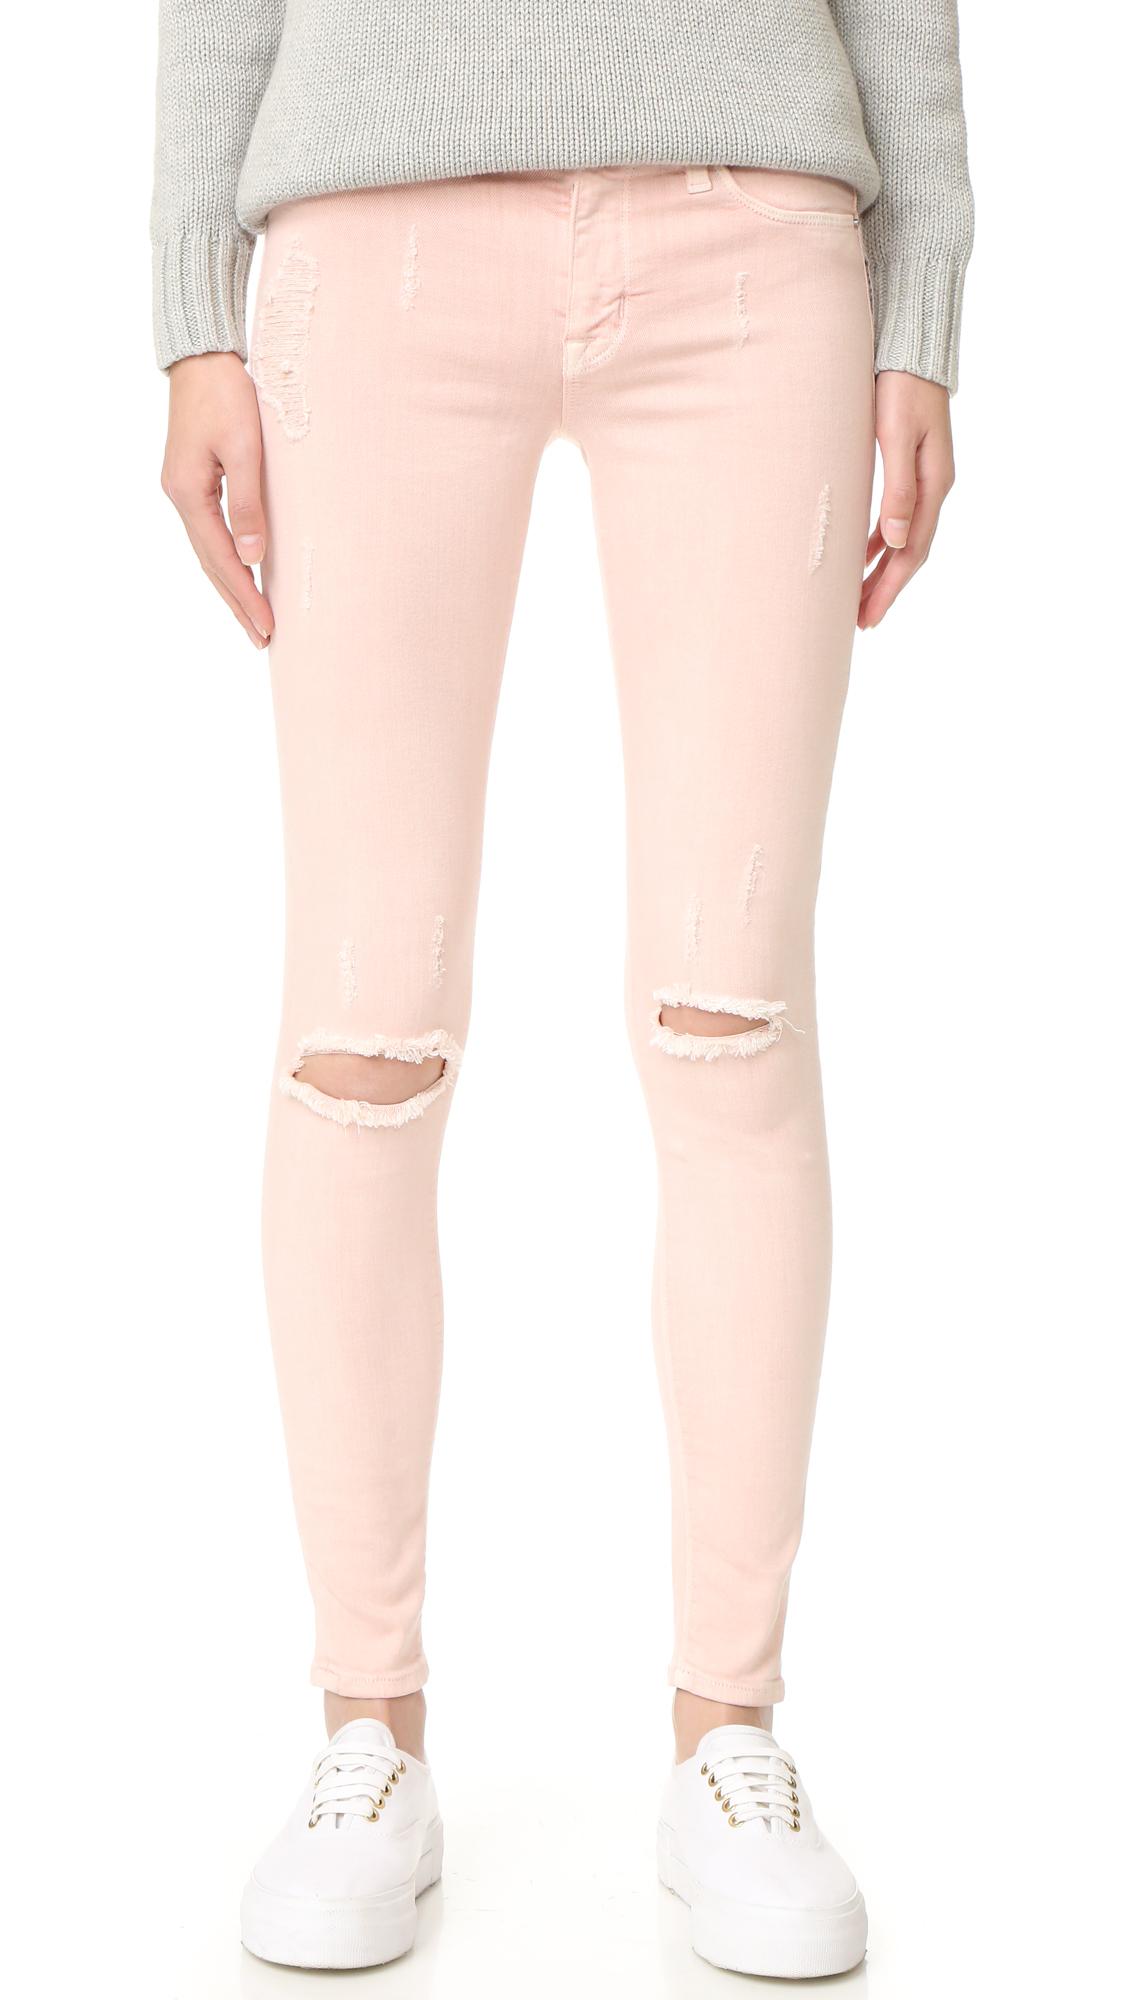 Hudson Nico Mid Rise Super Skinny Jeans - Sunkissed Pink Destructed at Shopbop